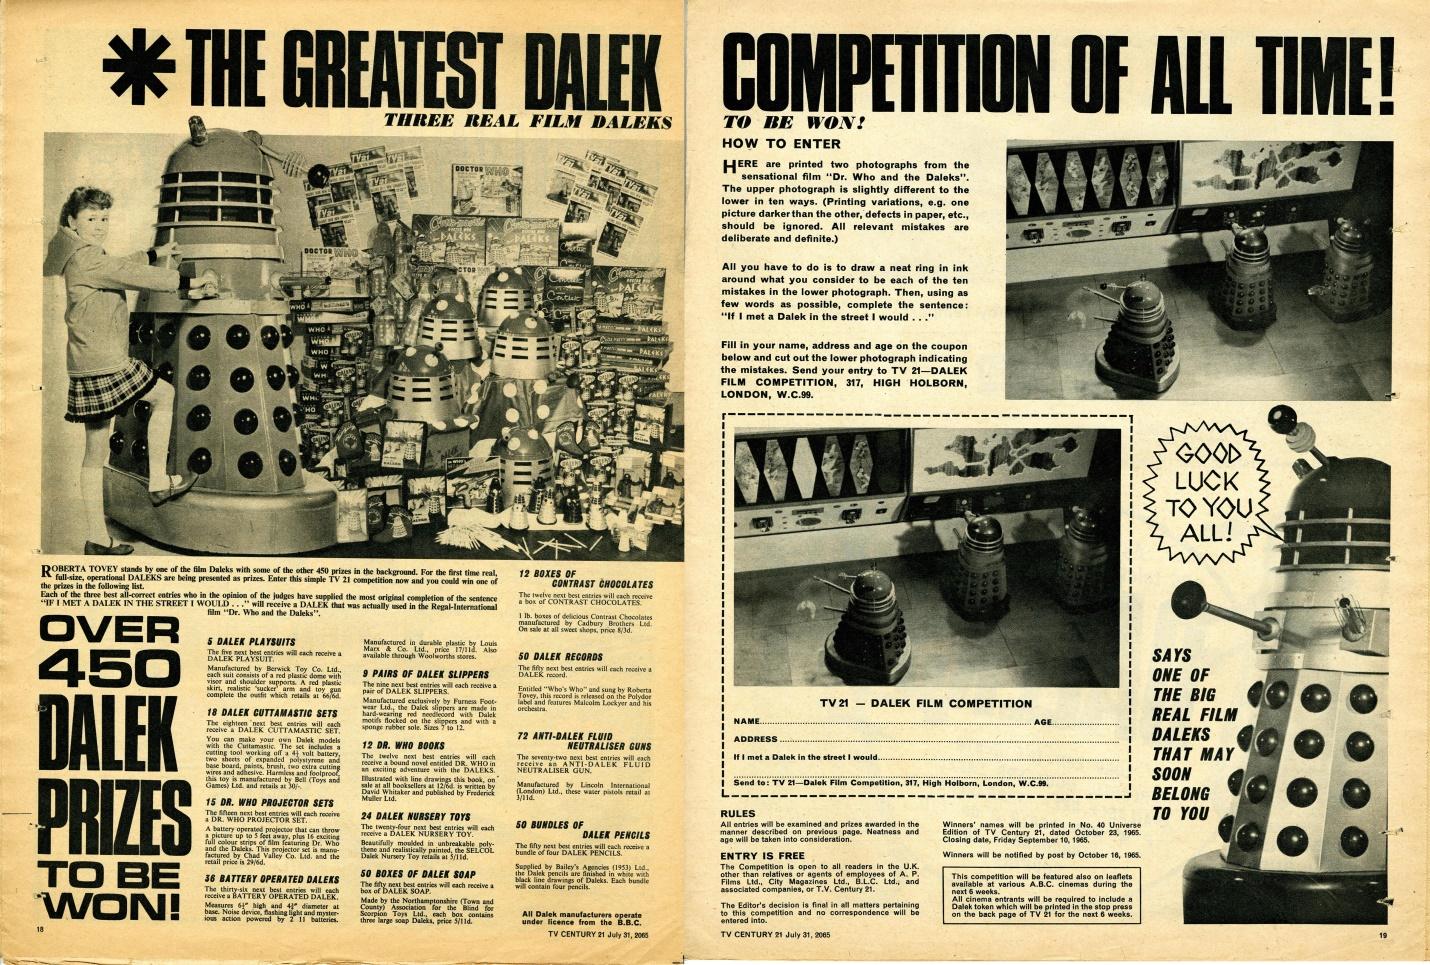 TV Century 21 no. 28, Dalek Competition, 31 July 2065 (1965)